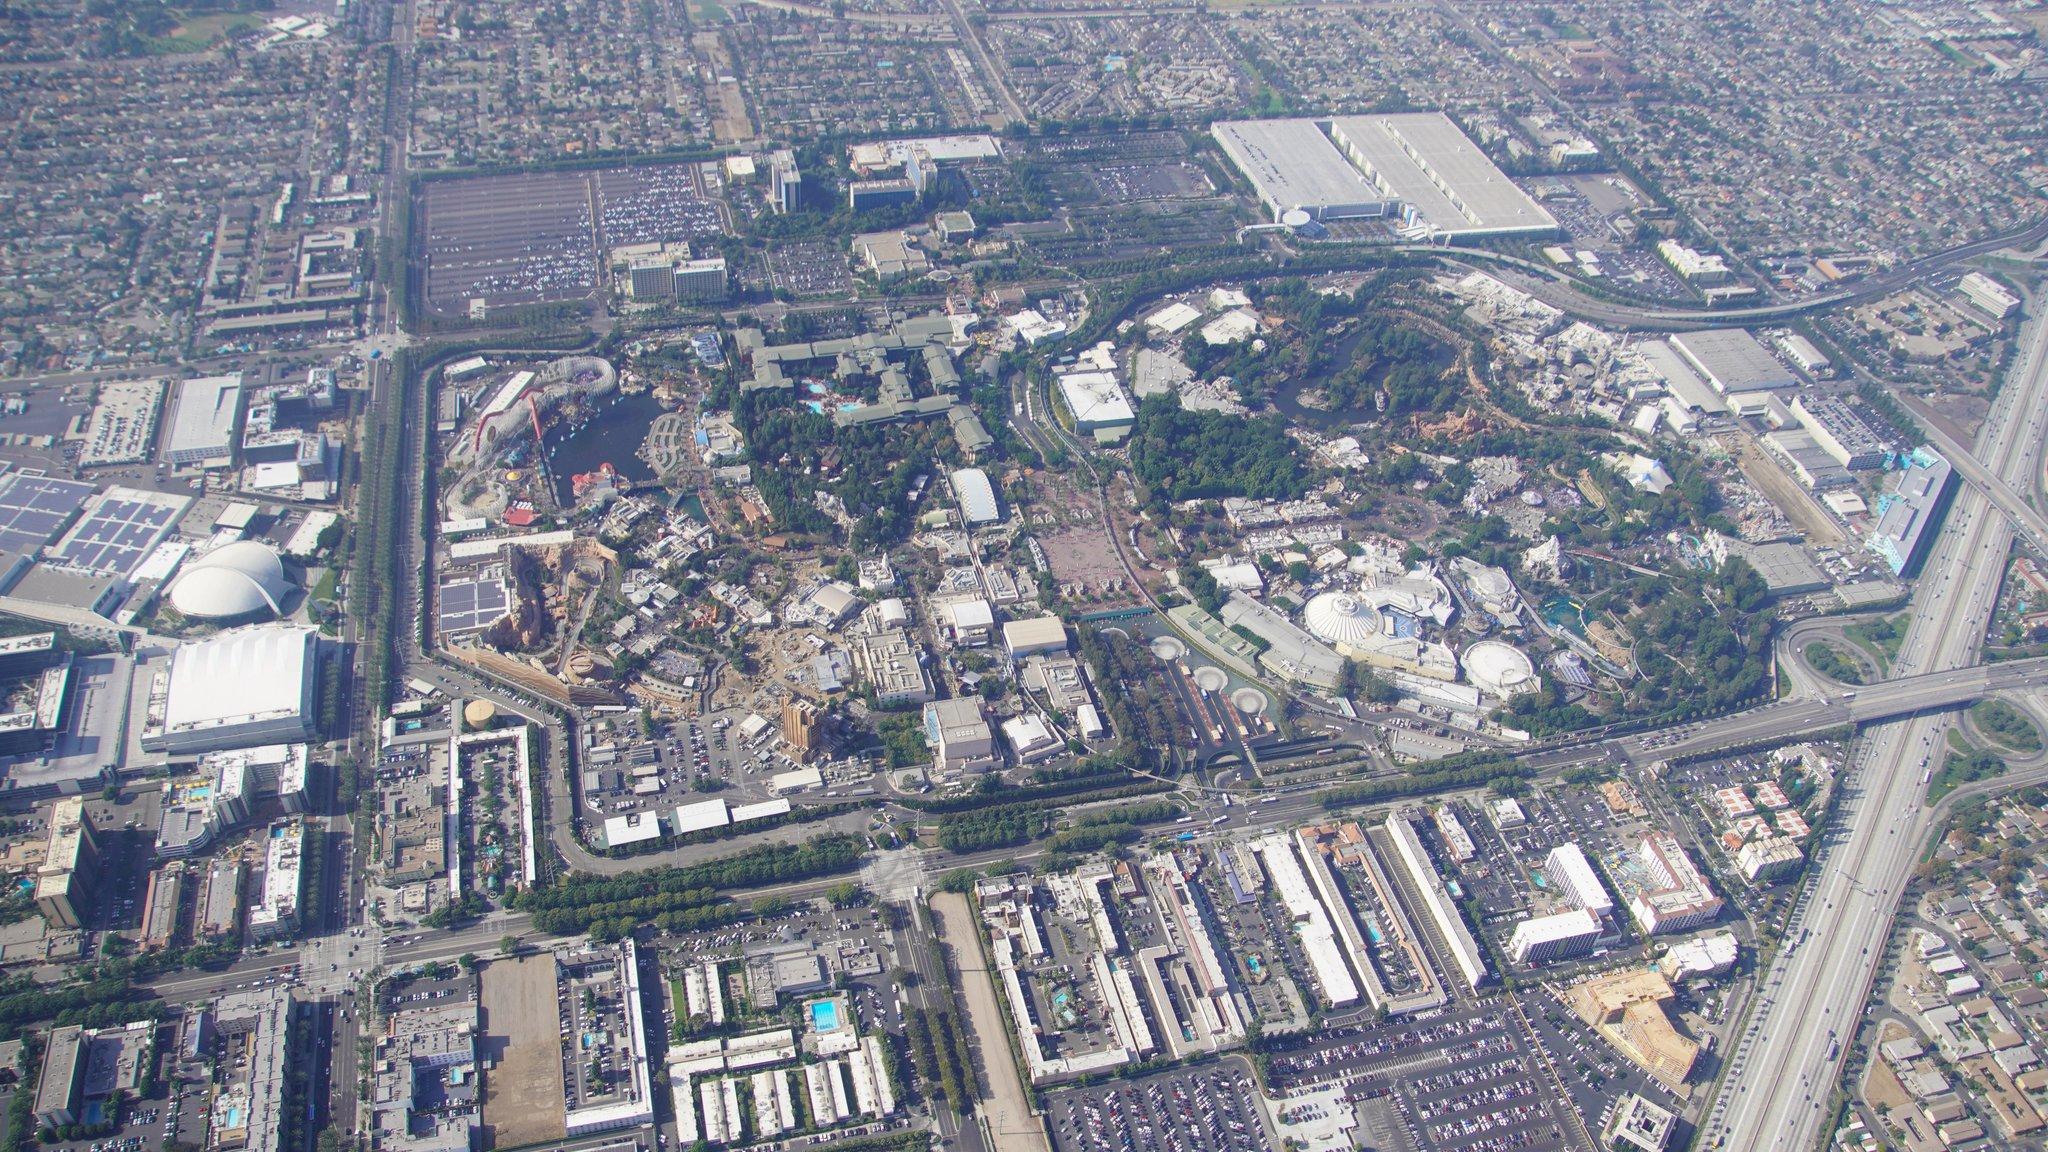 Disneyland Resort vu du ciel, des images sublimes! EJXG4EeWwAAwTzZ?format=jpg&name=4096x4096